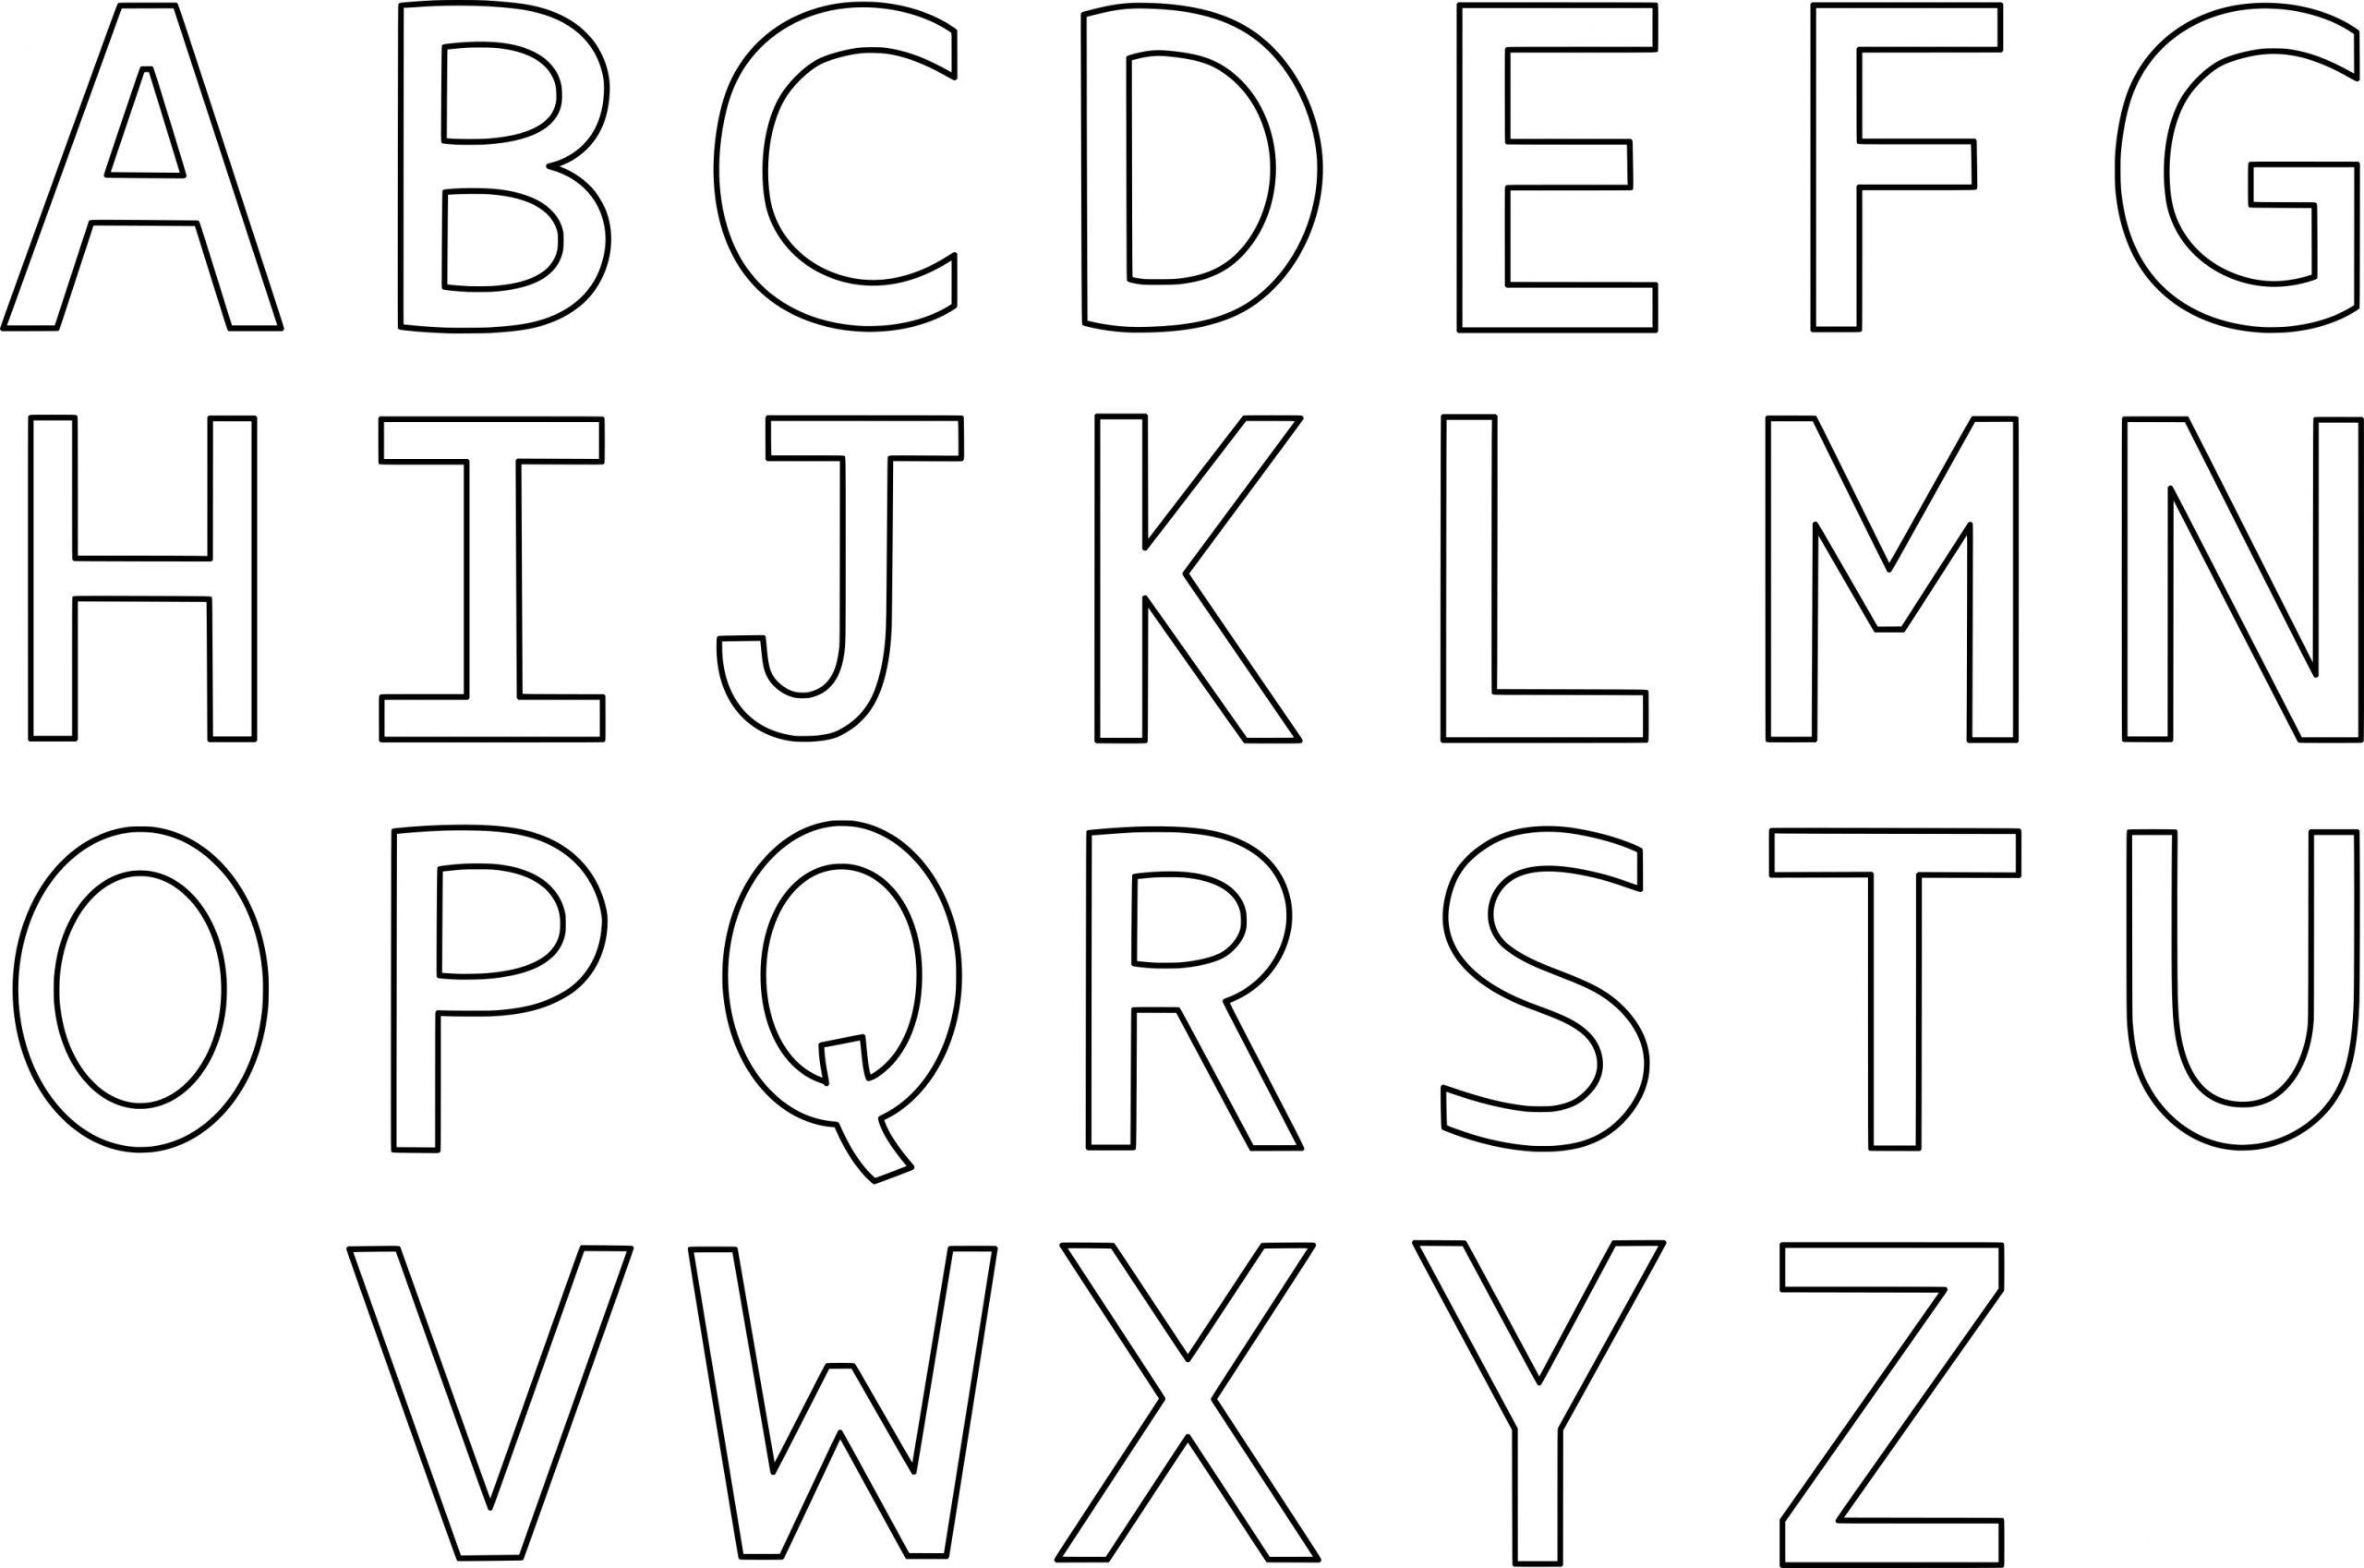 Coloriage Alphabet À Imprimer encequiconcerne Alphabet Français À Imprimer